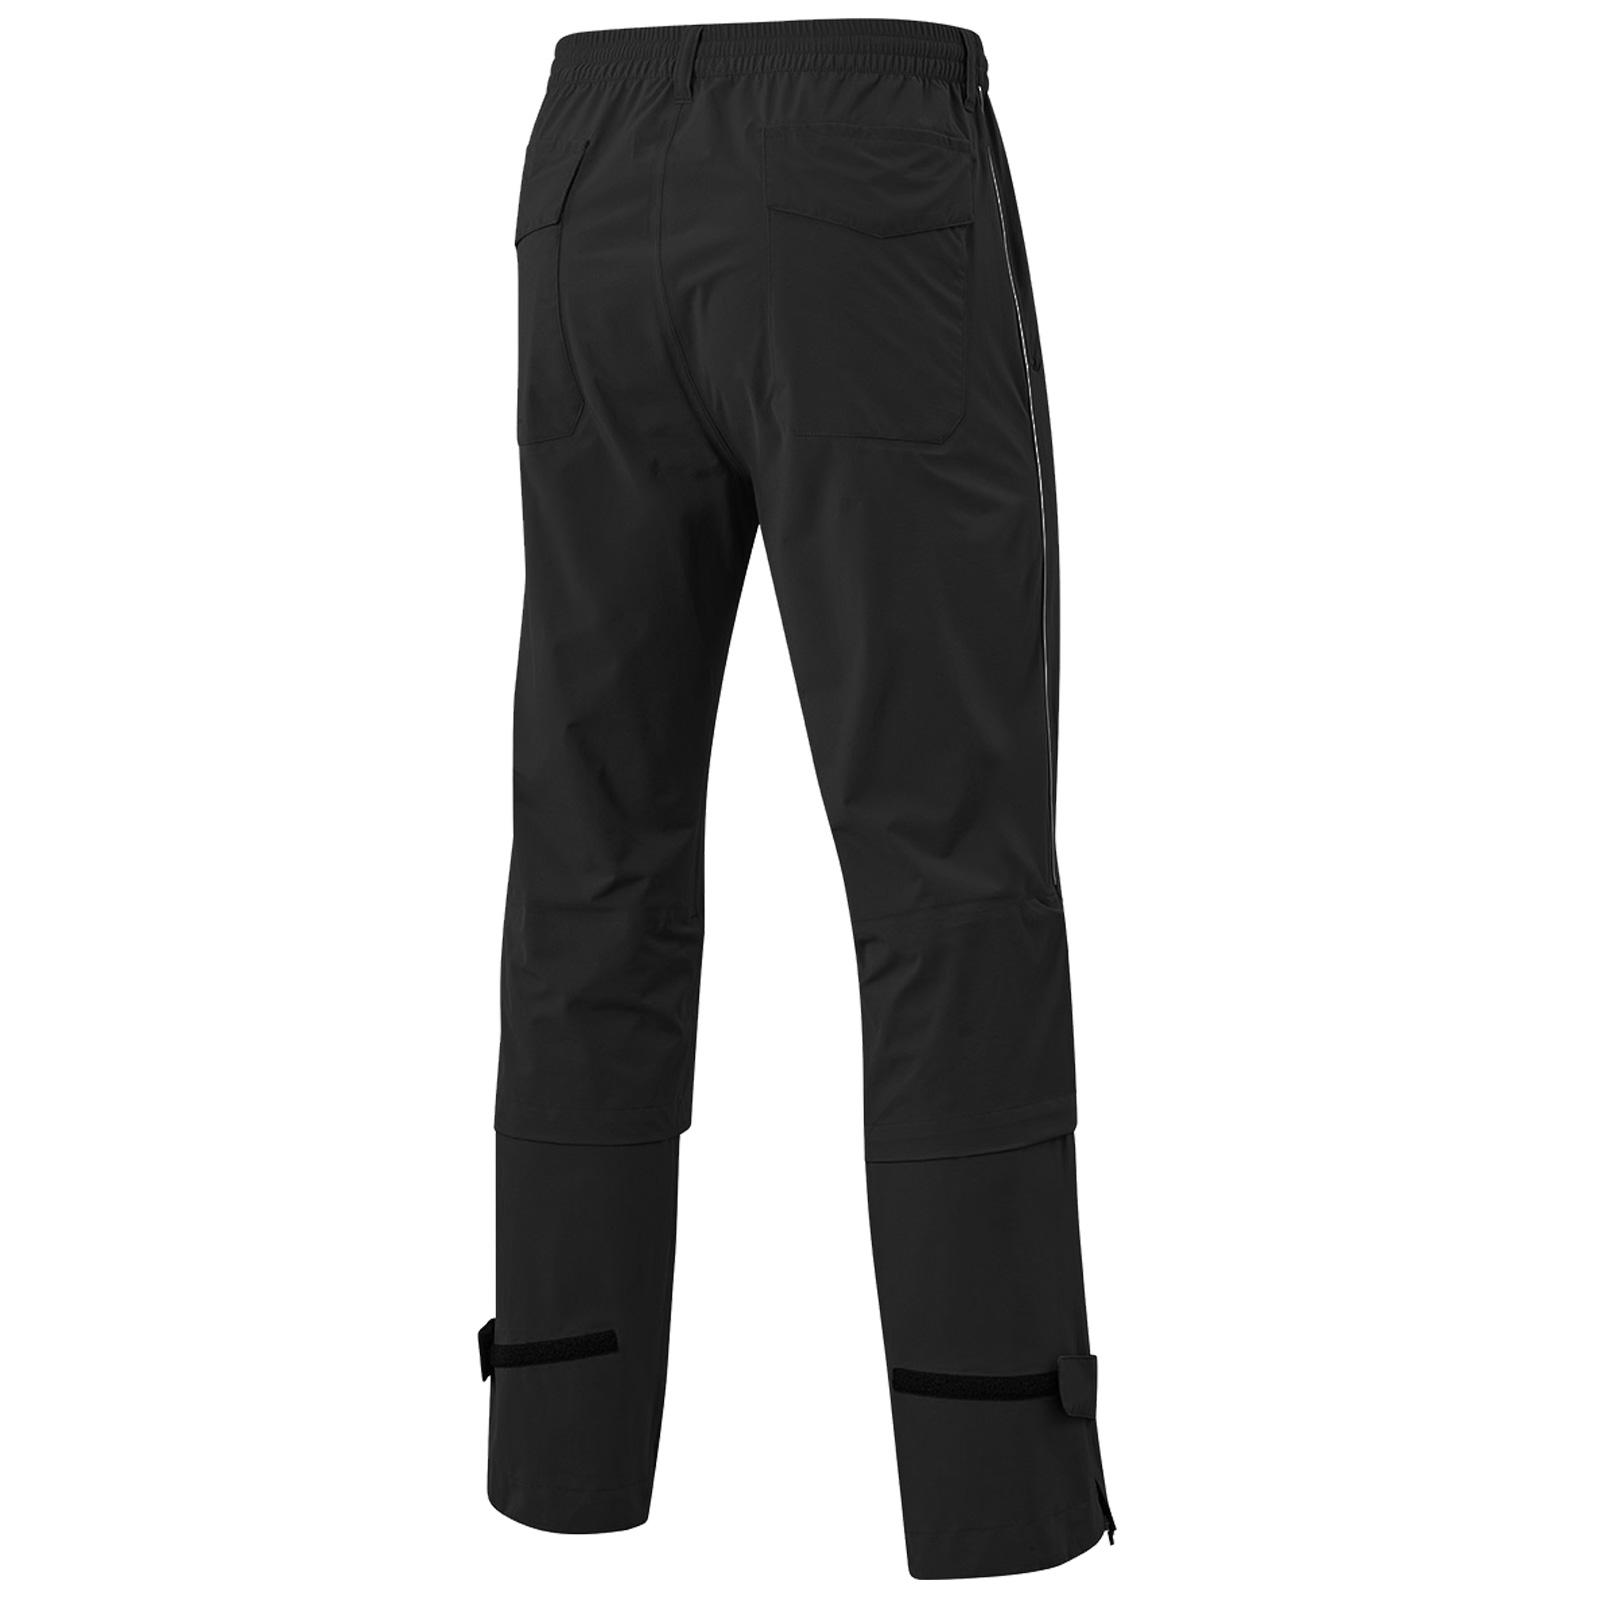 Mizuno-Mens-Impermalite-F20-Waterproof-Rain-Trousers-Lightweight-Golf-Pant thumbnail 3